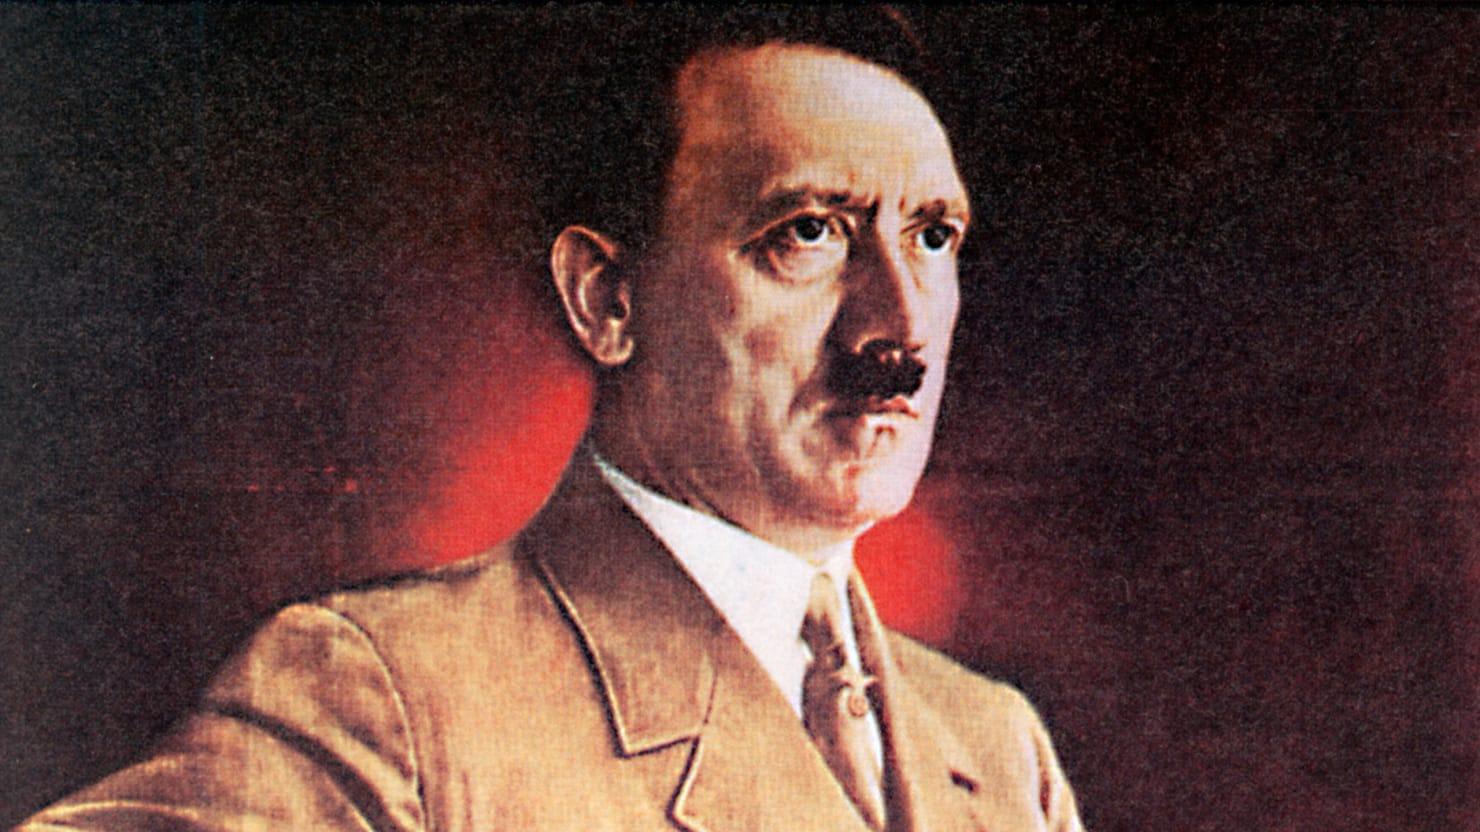 Hitler the Mass-Murdering Ecologist?